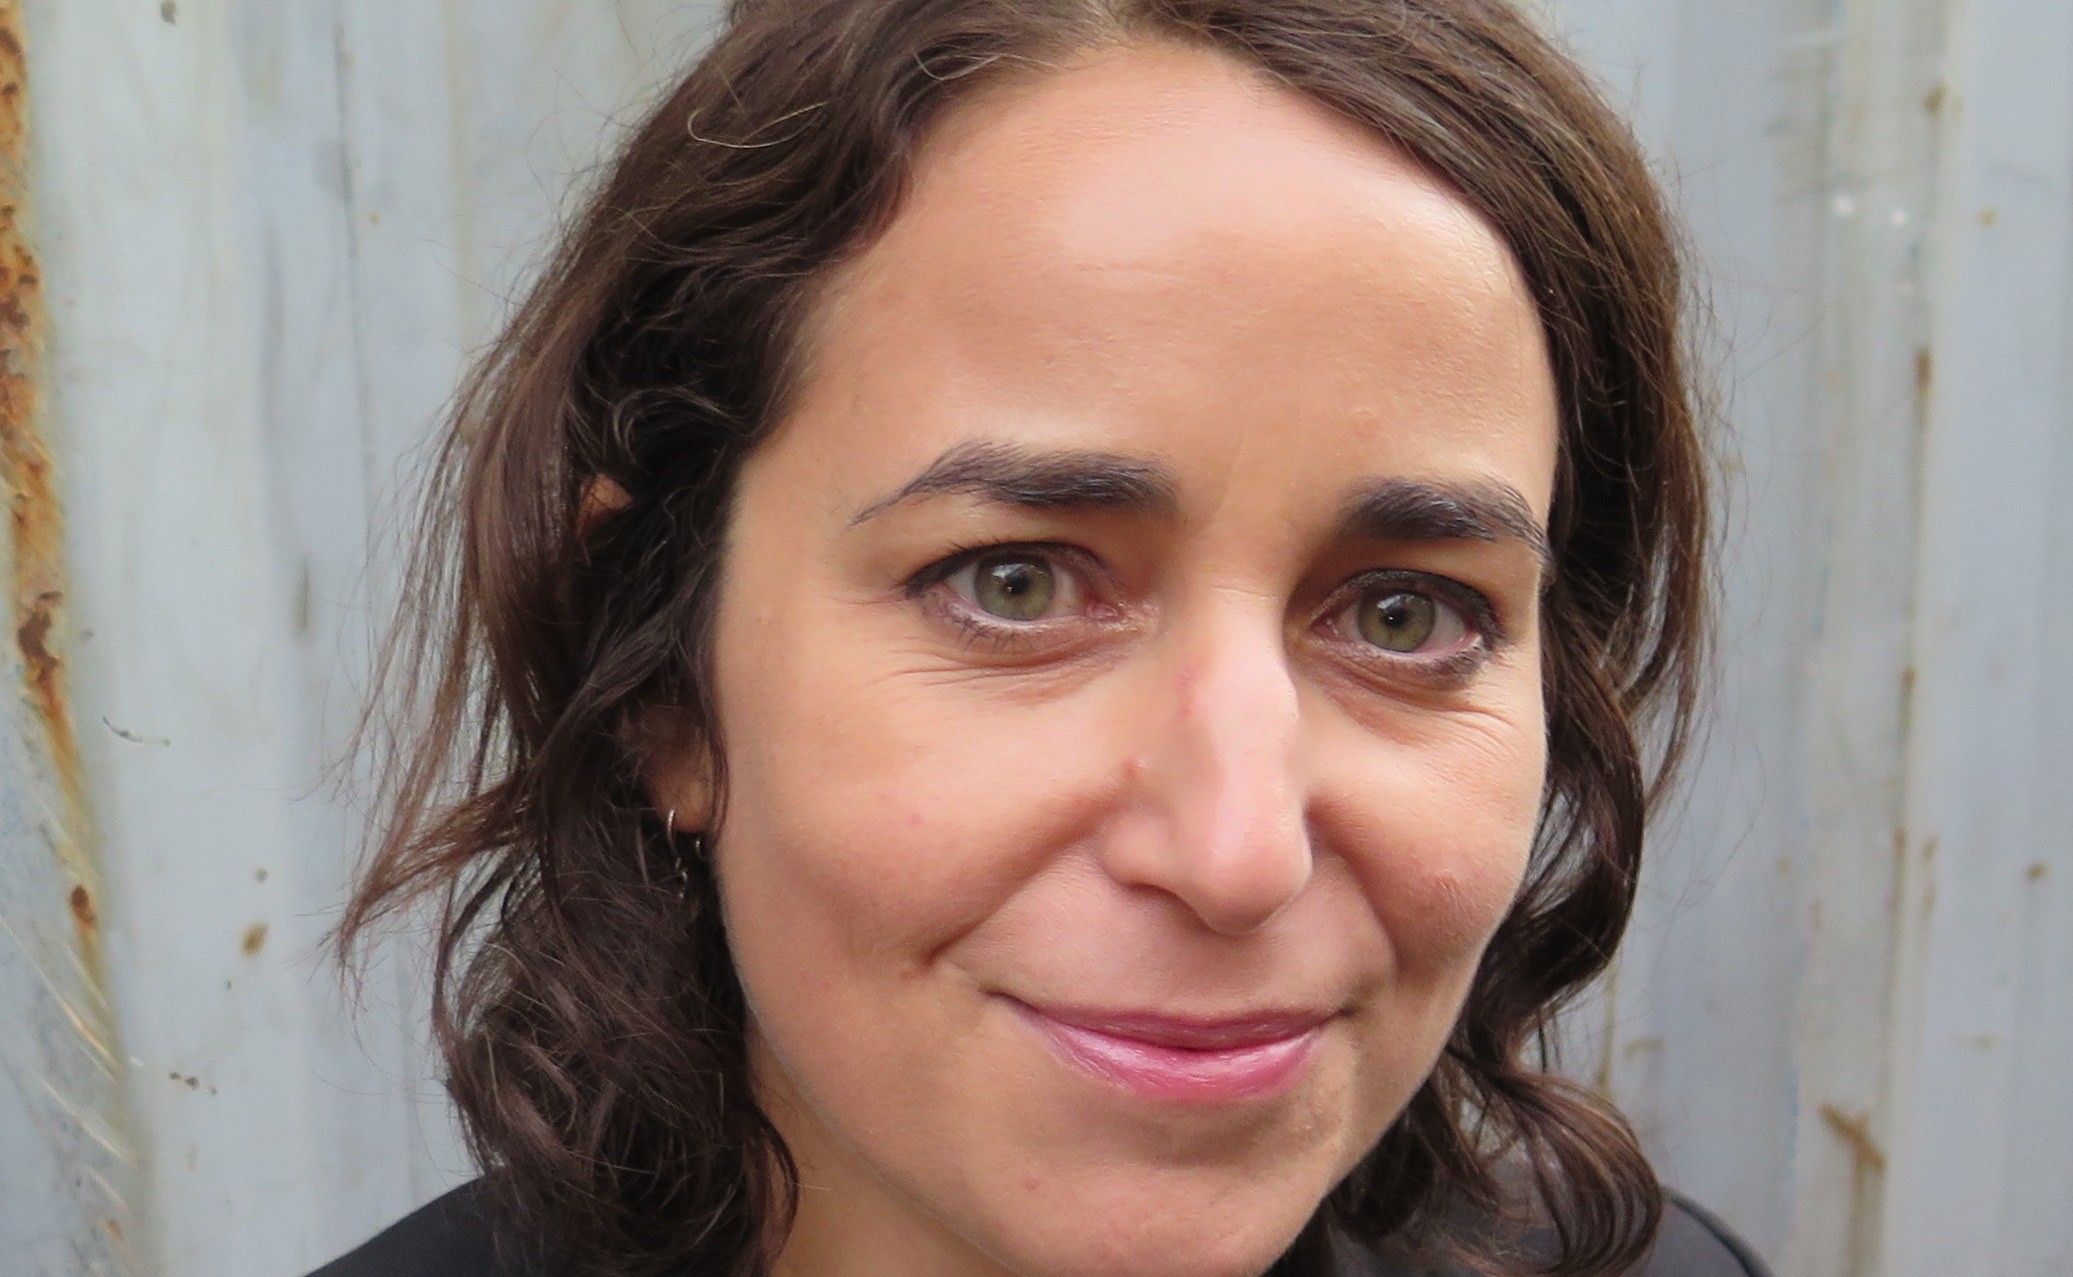 Nicola Levy